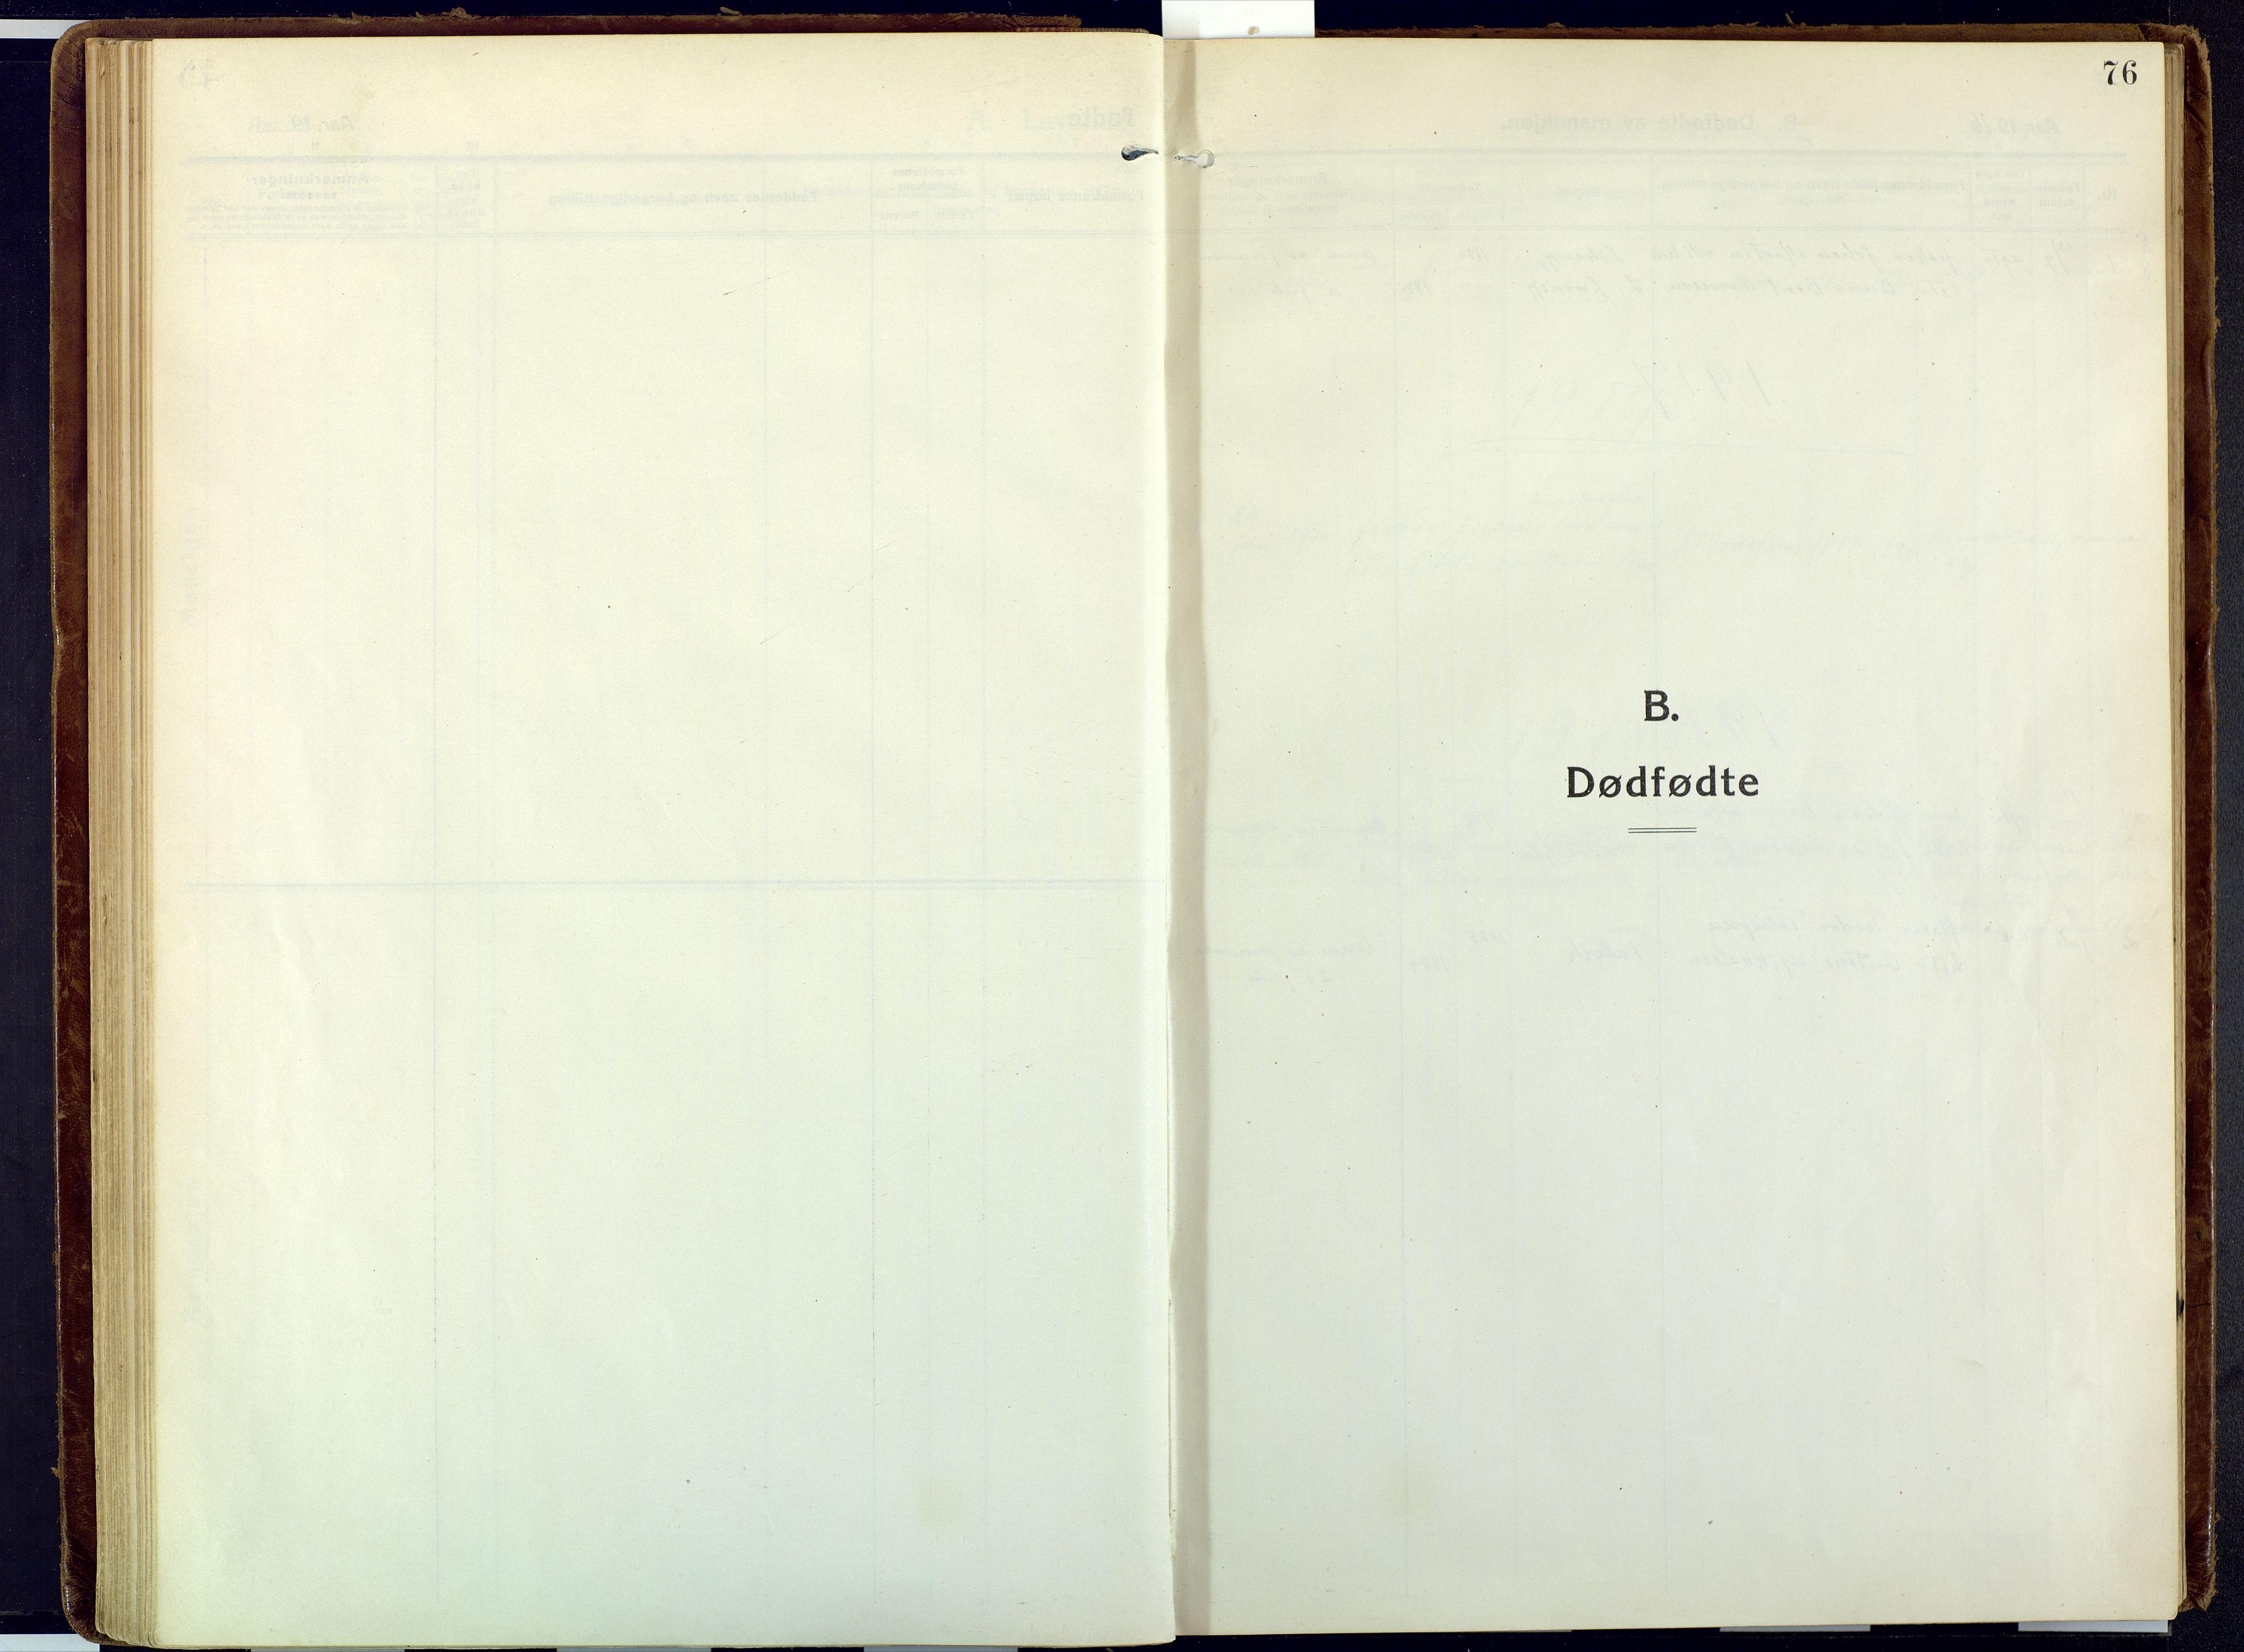 SATØ, Talvik sokneprestkontor, H/Ha/L0018kirke: Ministerialbok nr. 18, 1915-1924, s. 76